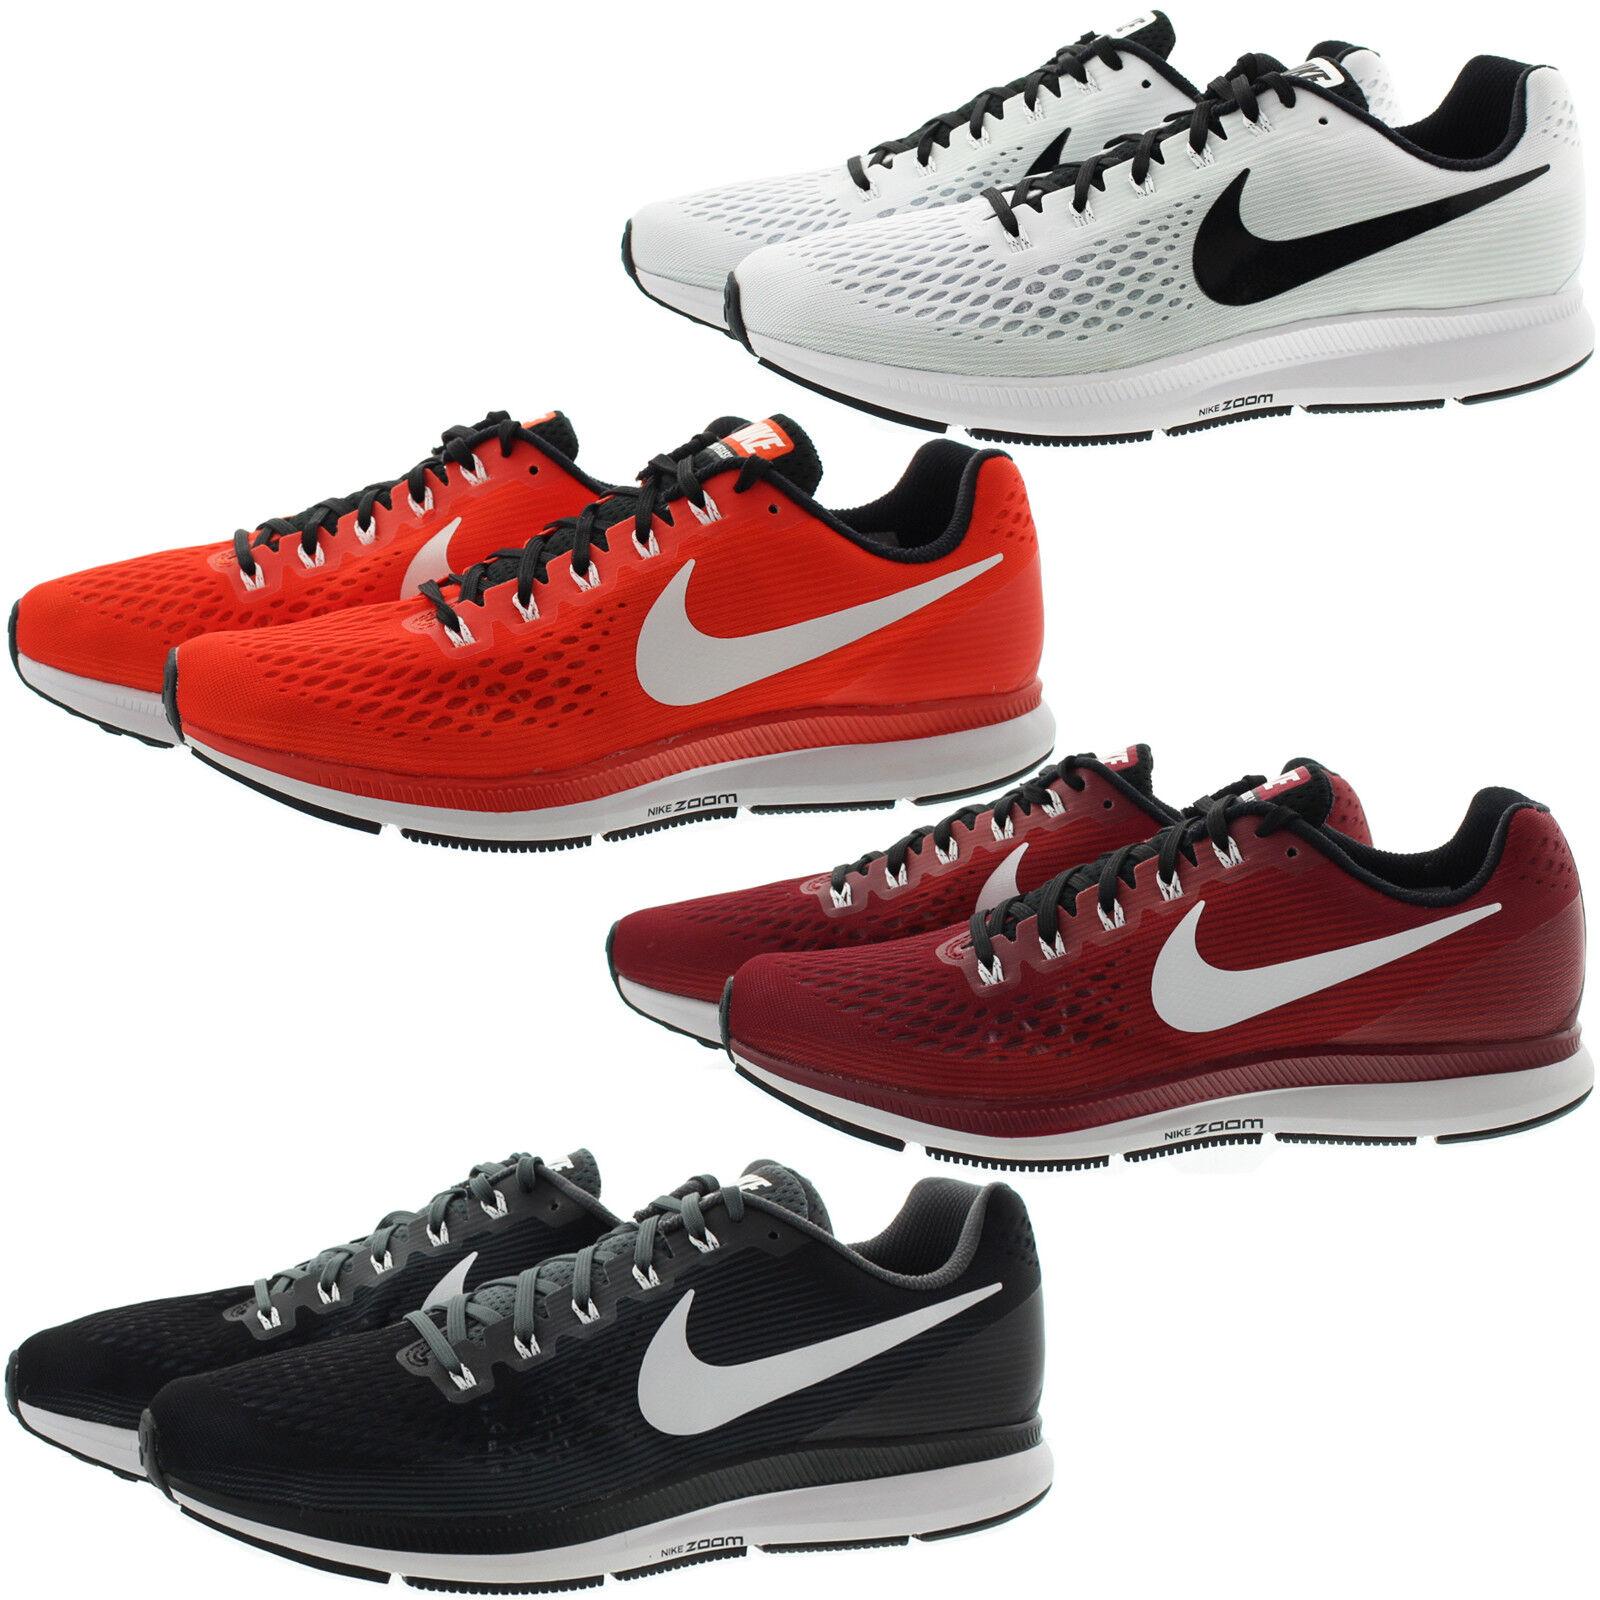 Nike 887009 Men's Air Zoom Lunarglide 9 Low Top Running shoes Sneakers